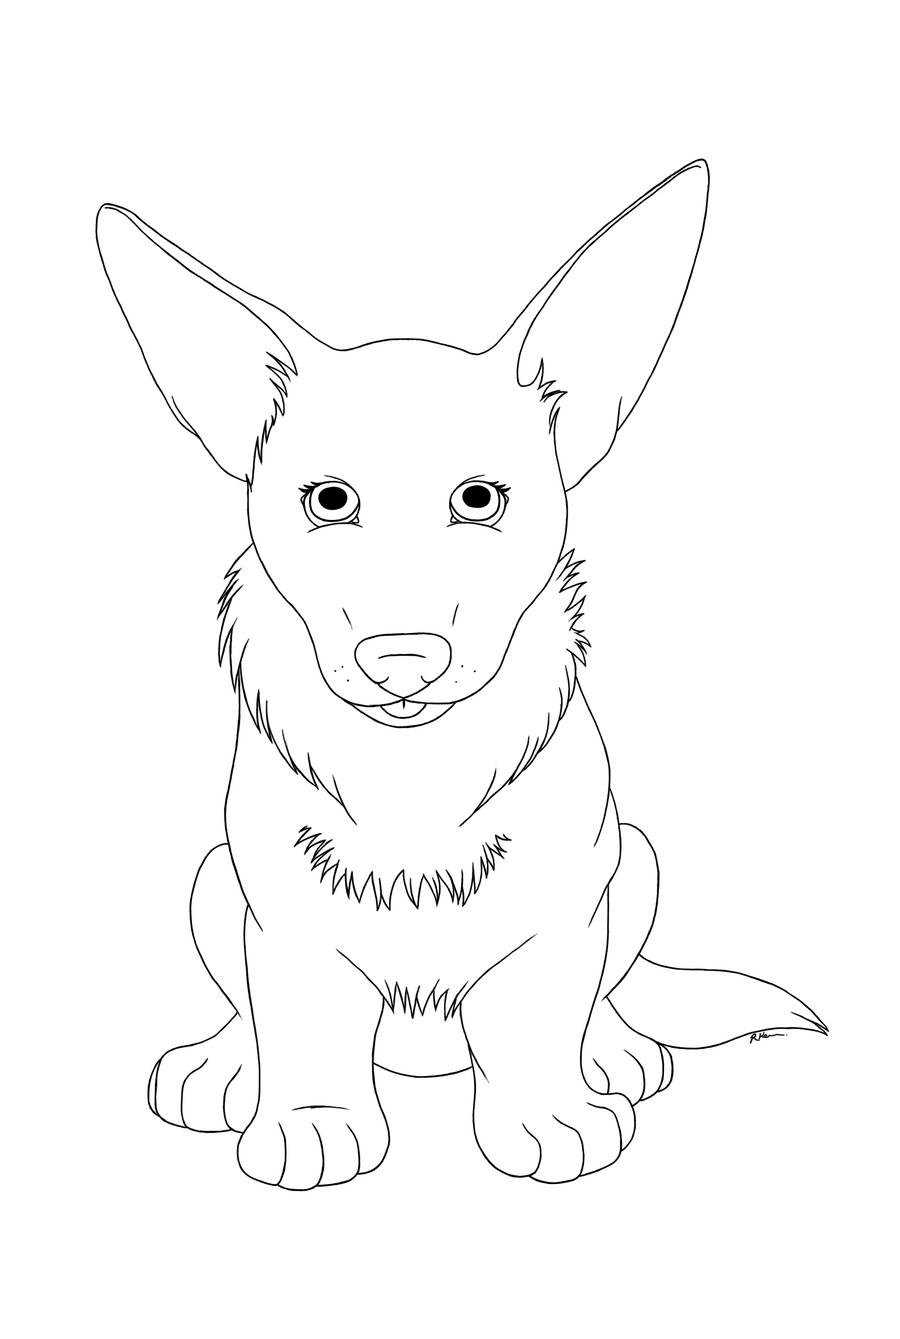 Cute Corgi Puppy - FREE Lineart by Crimson-Mane on DeviantArt